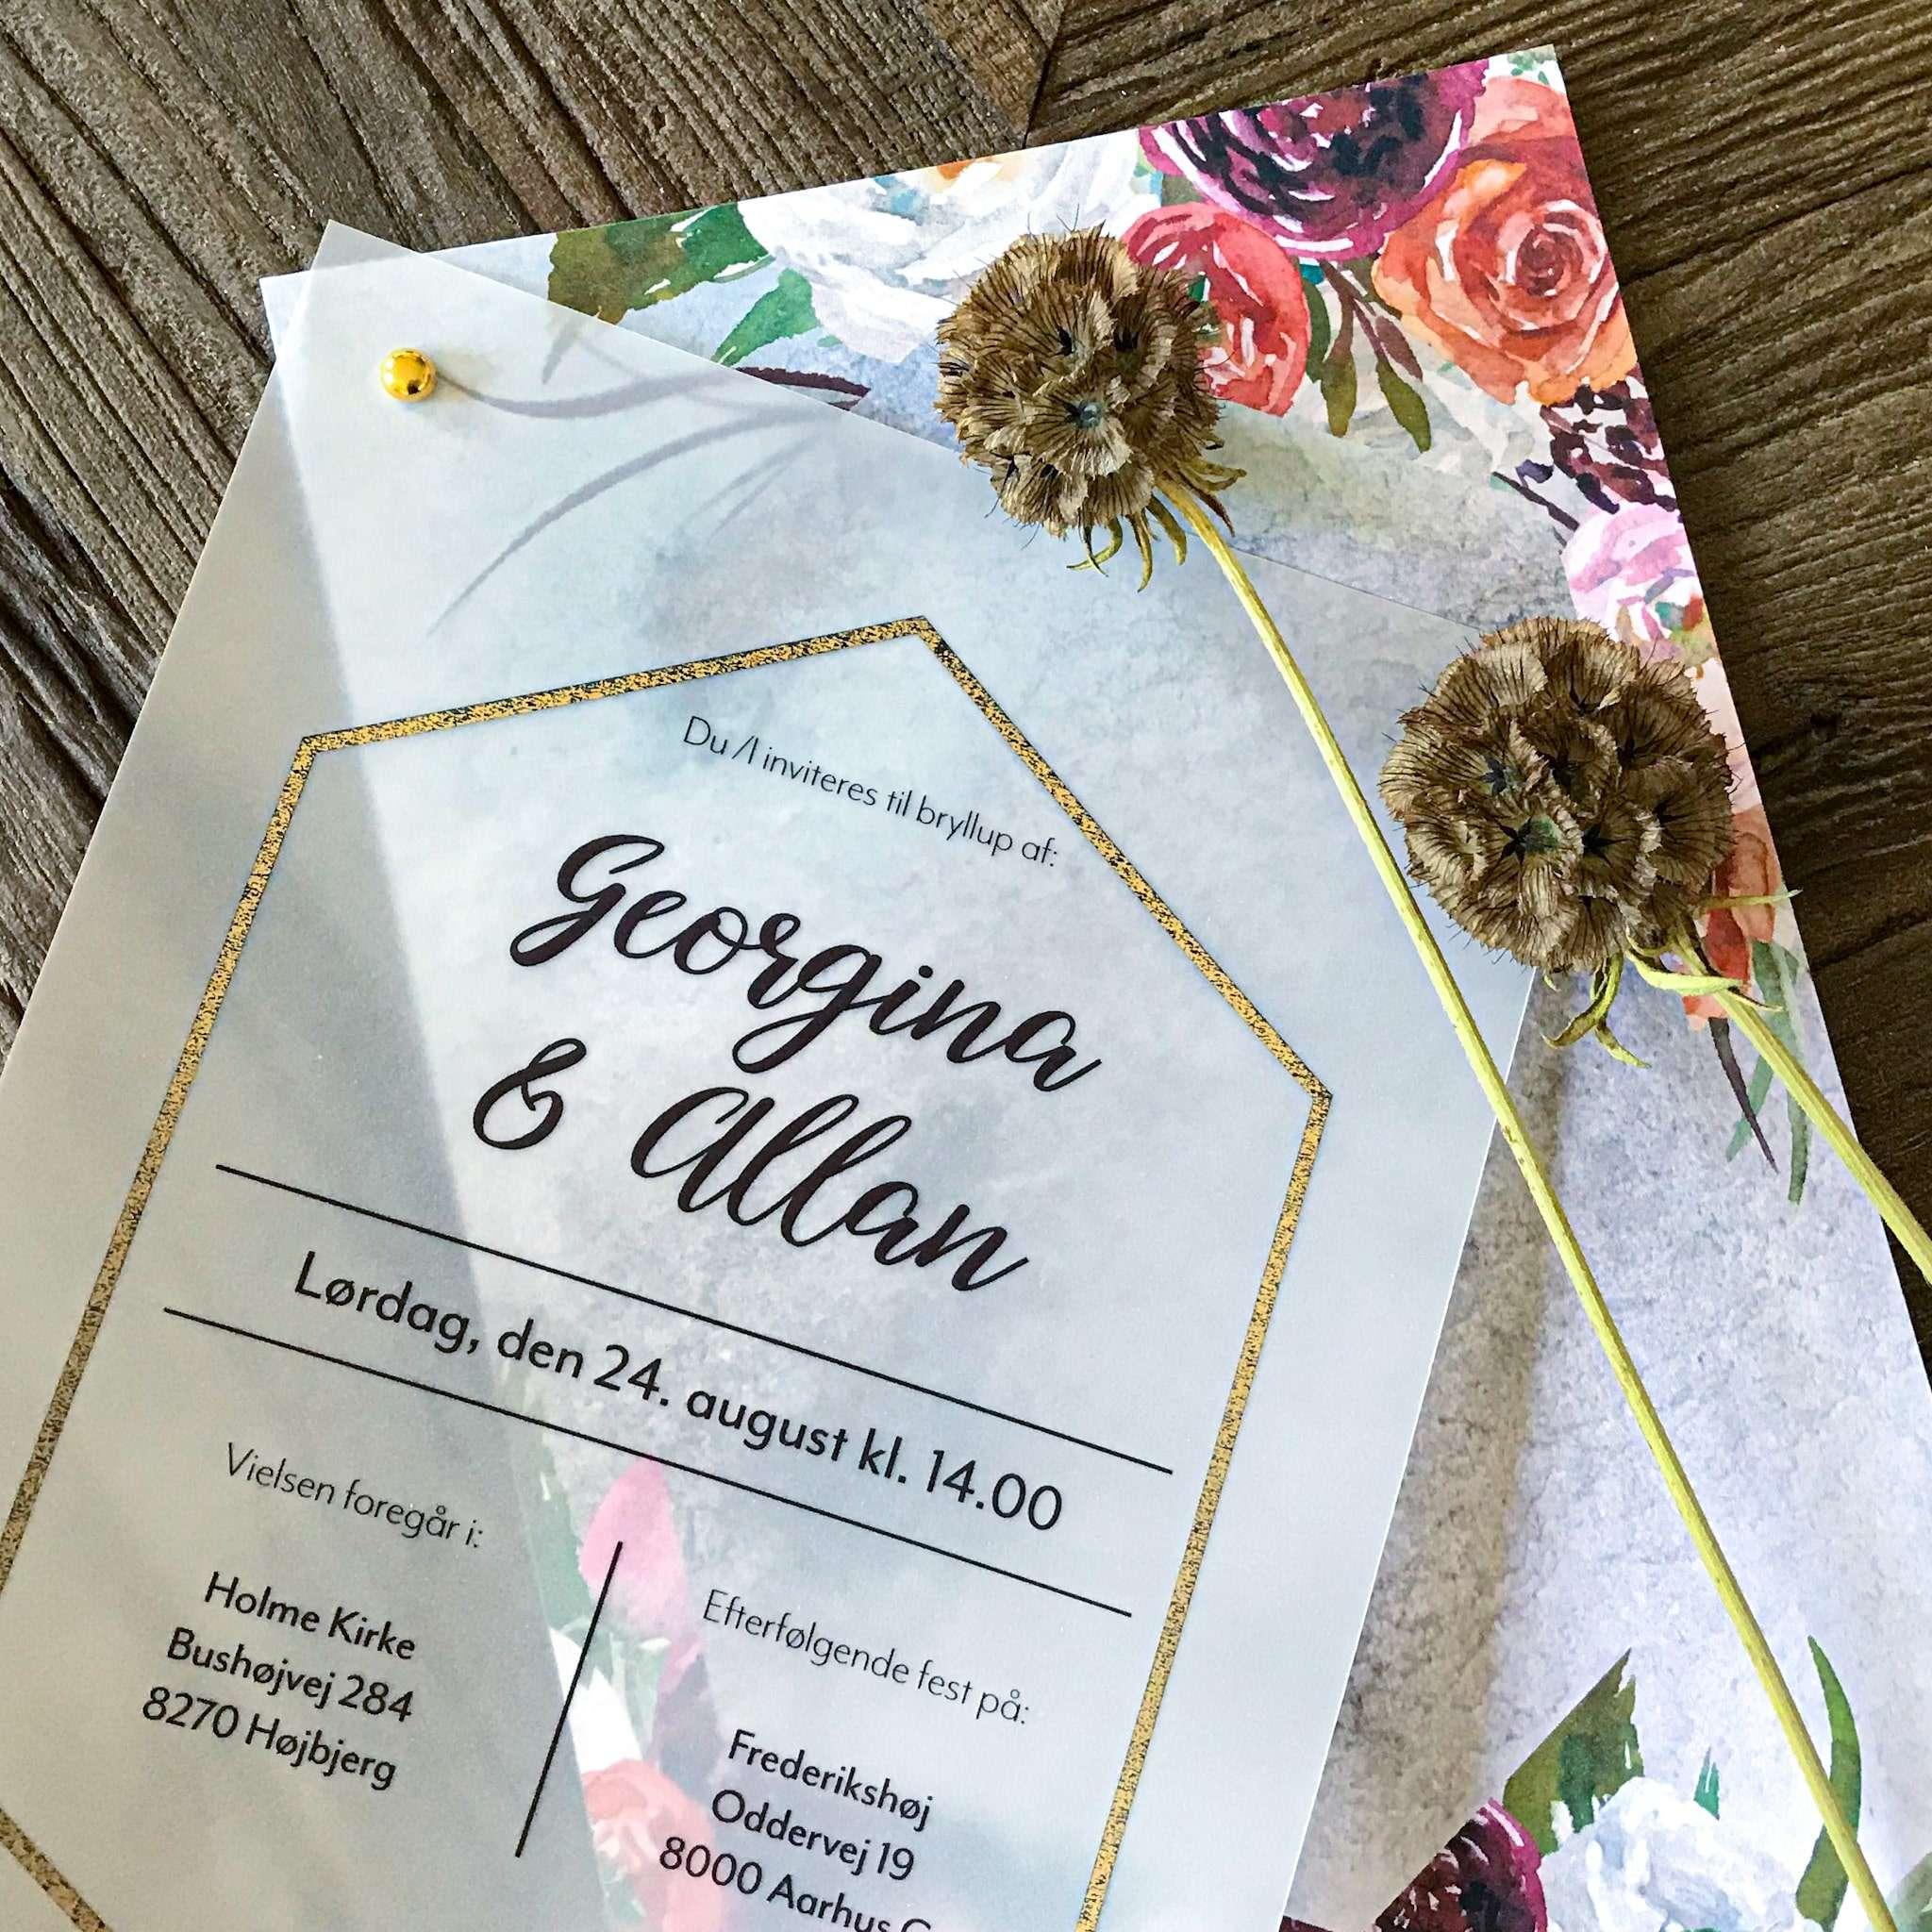 Fleur Boheme bryllupsinvitation - 4 varianter: Ocean, Olive, Peach og Eternal.  Med vellumforside (kalkerpapir) og antikguld folie ramme. Perfekt til et strandbryllup.